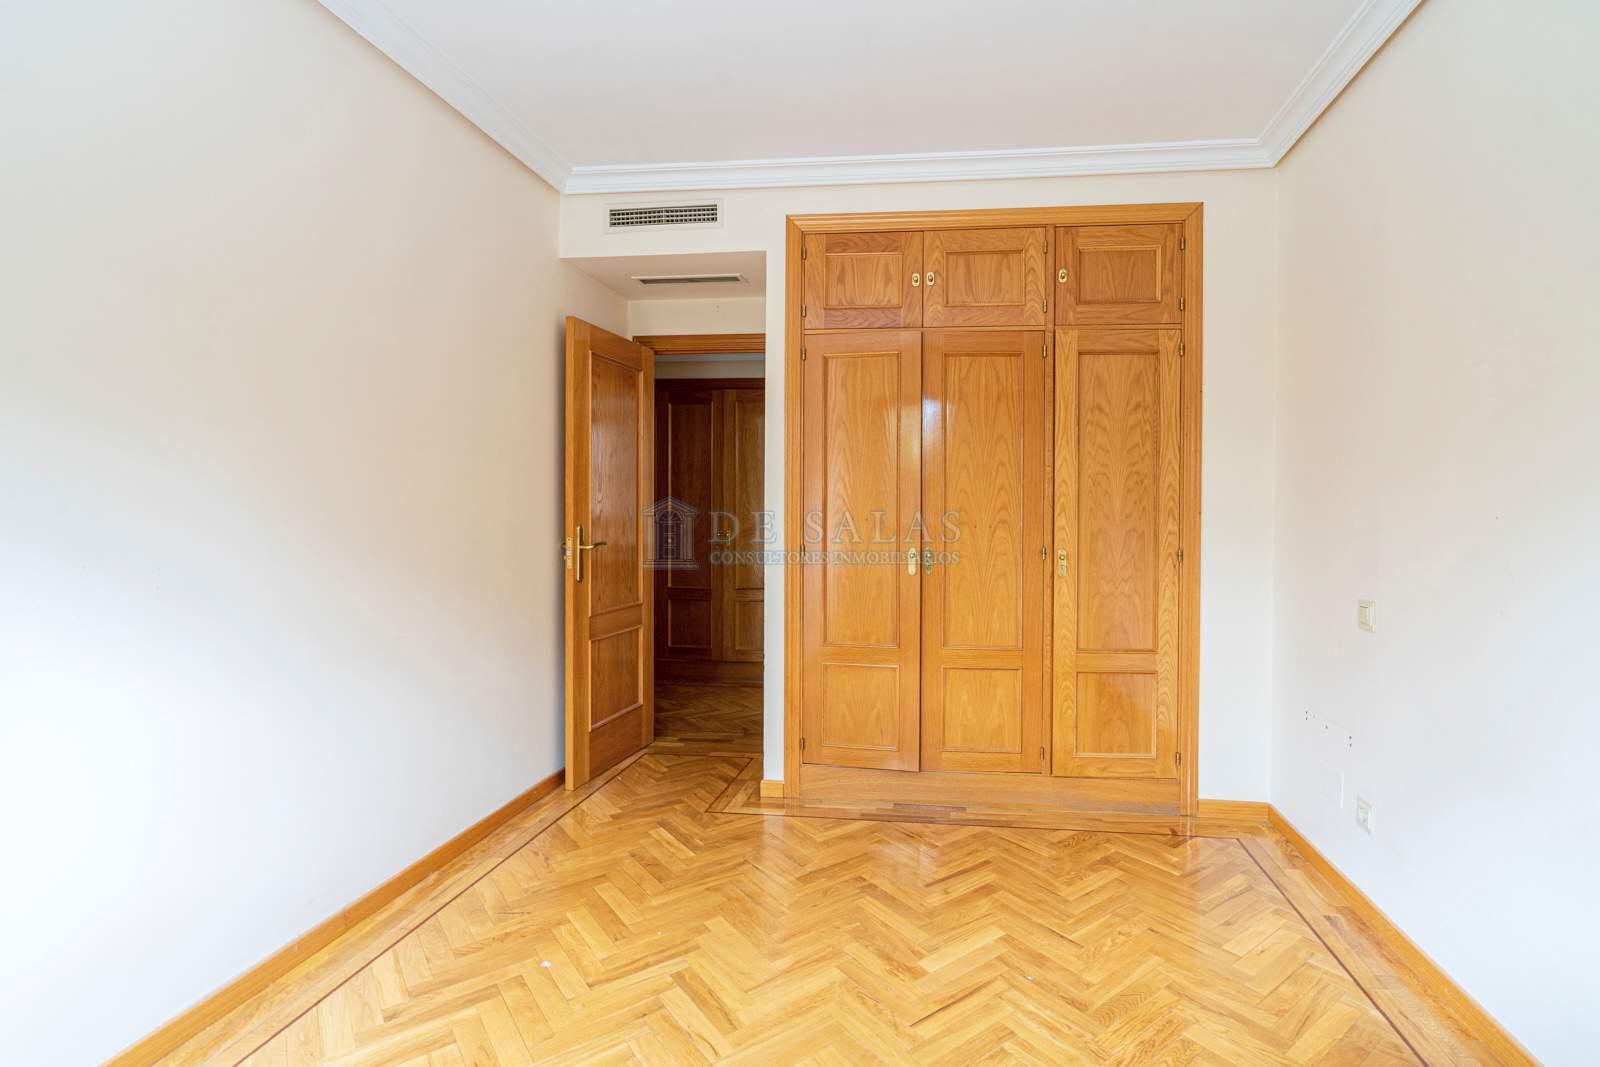 Dormitorio-0017